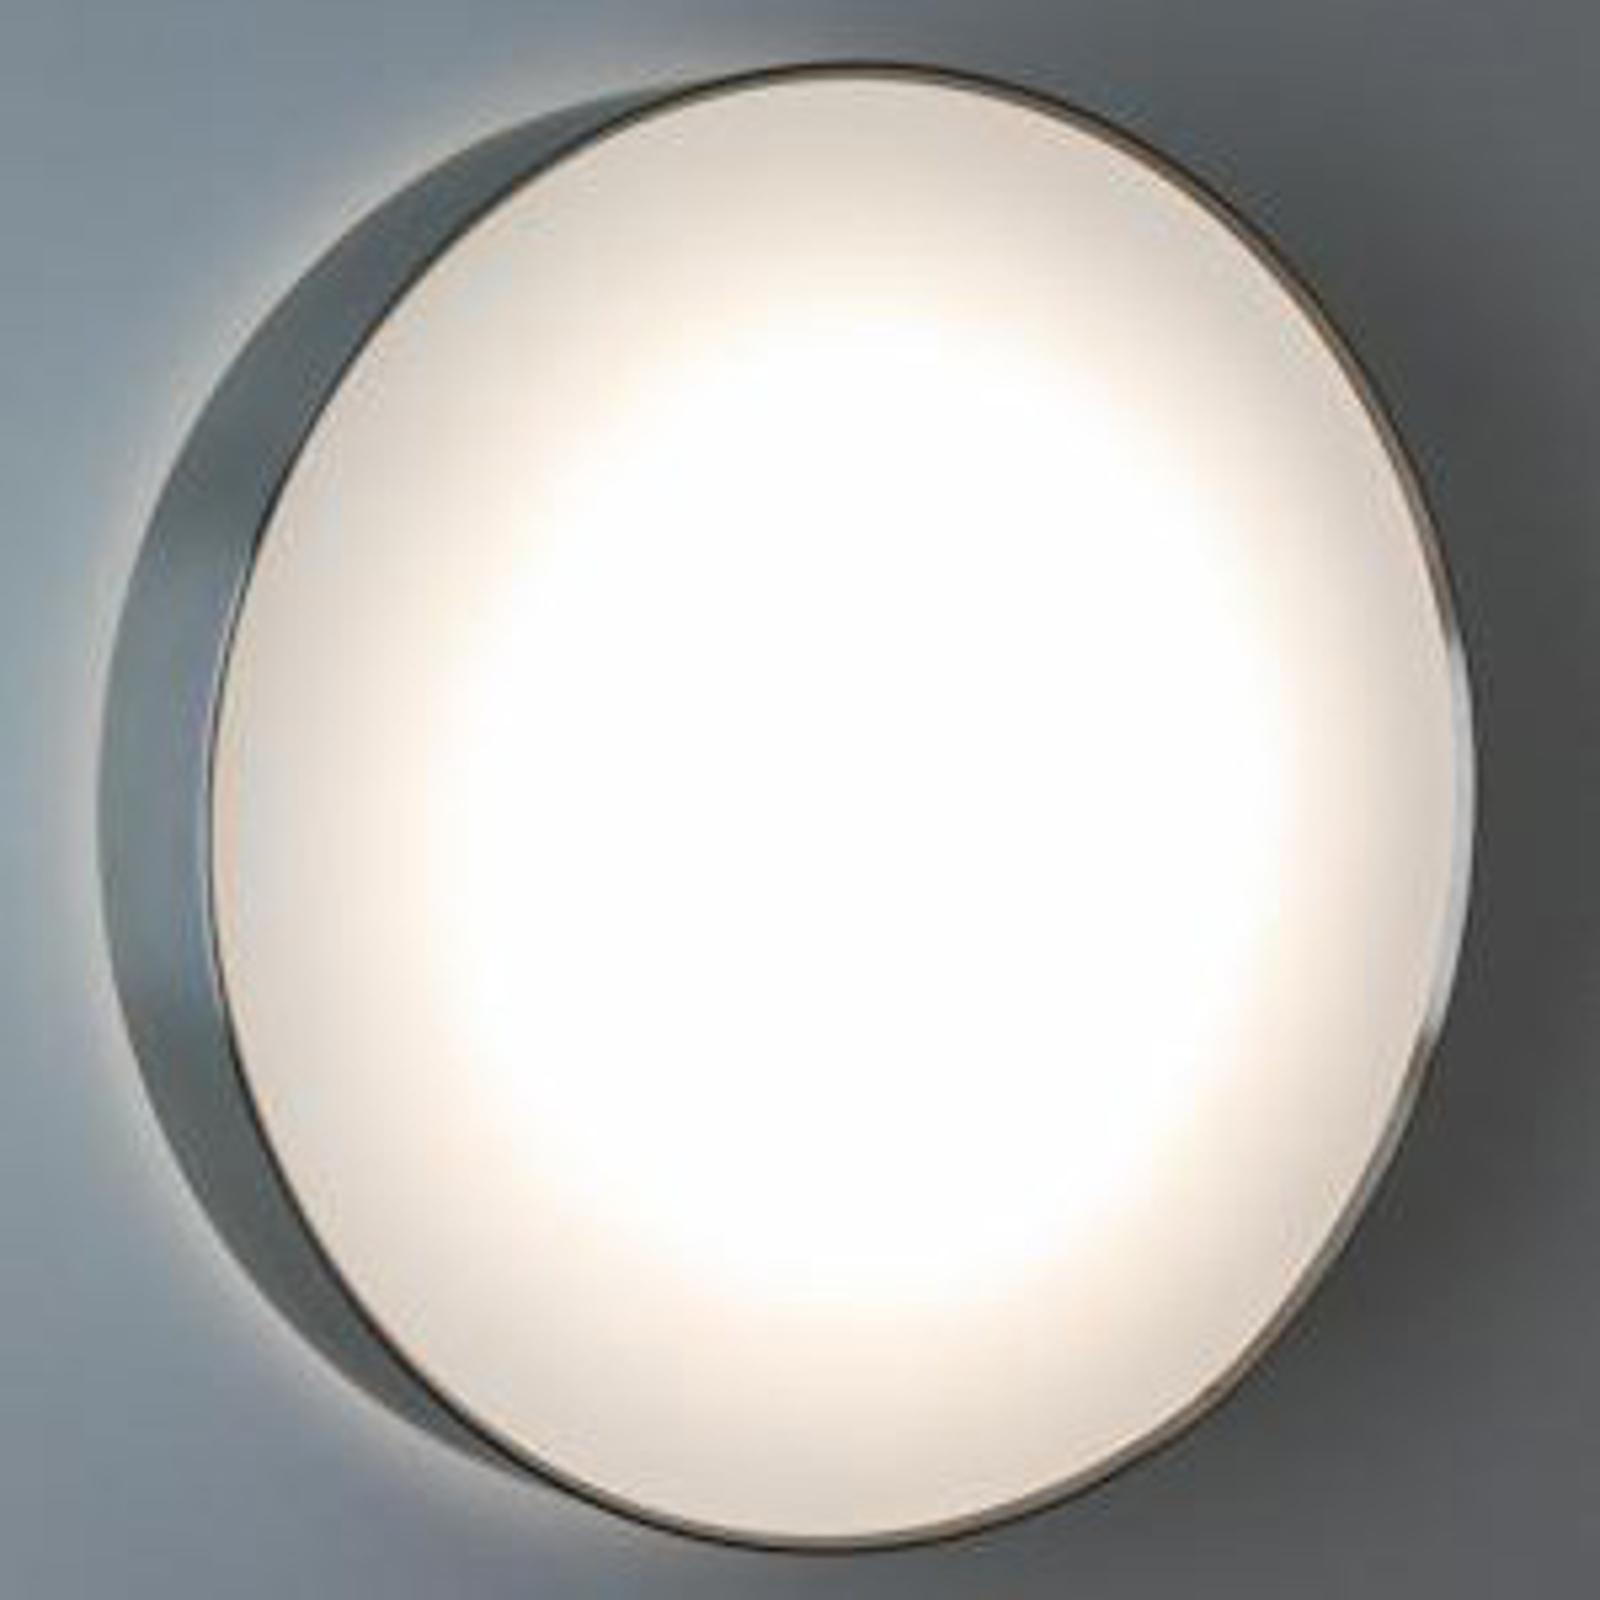 Sensor LED-edelstållampe SUN 4, 13 W